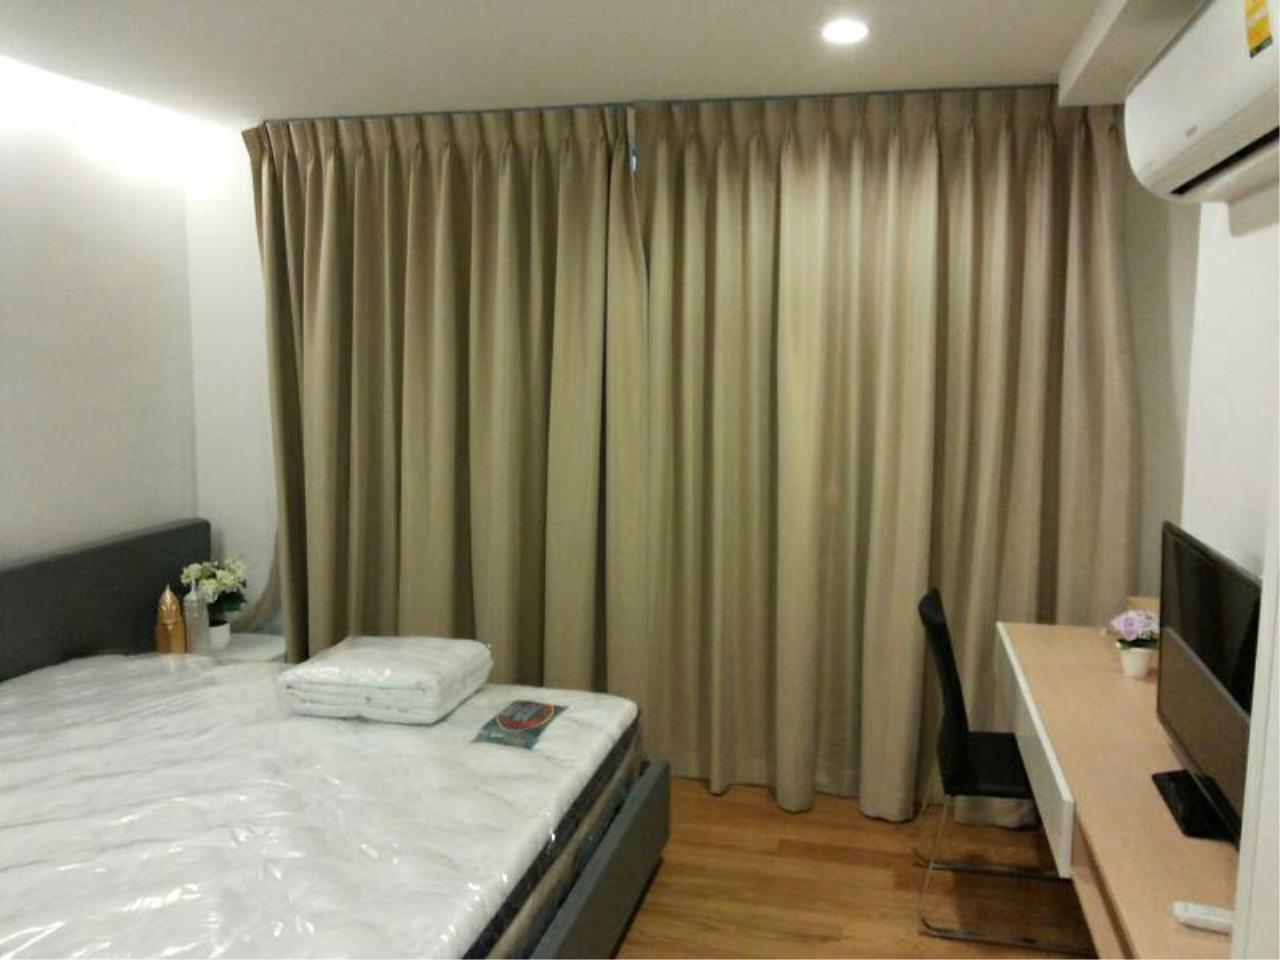 Quality Life Property Agency's FOR RENT! !! 15 SUKHUMVIT RESIDENCES / STUDIO 1 BETHROOM /  10 FLOOR 3